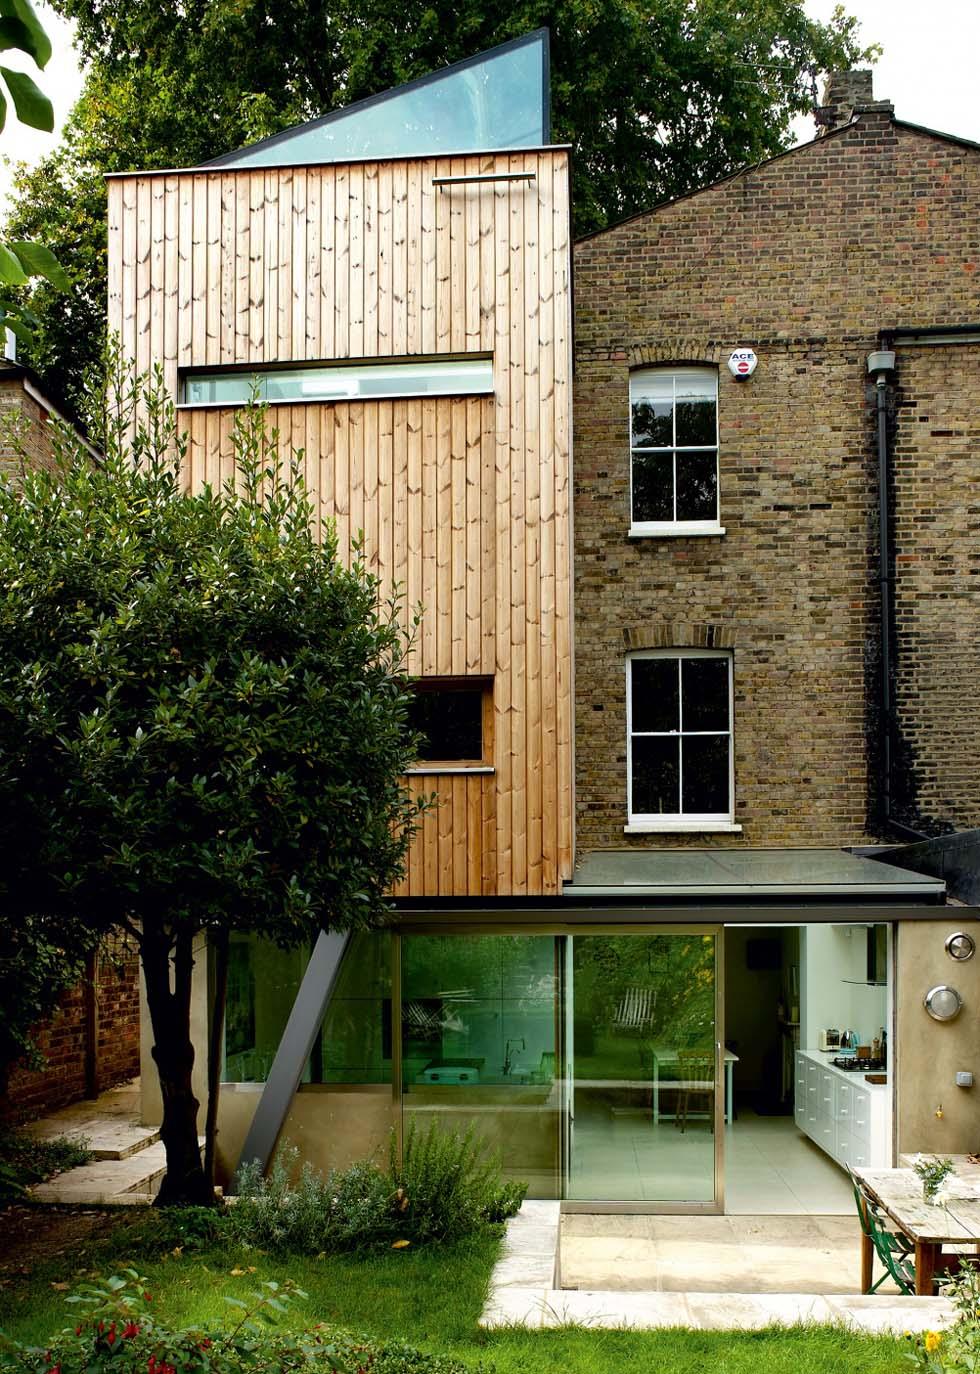 12 radical extensions homebuilding renovating for Homebuilding com